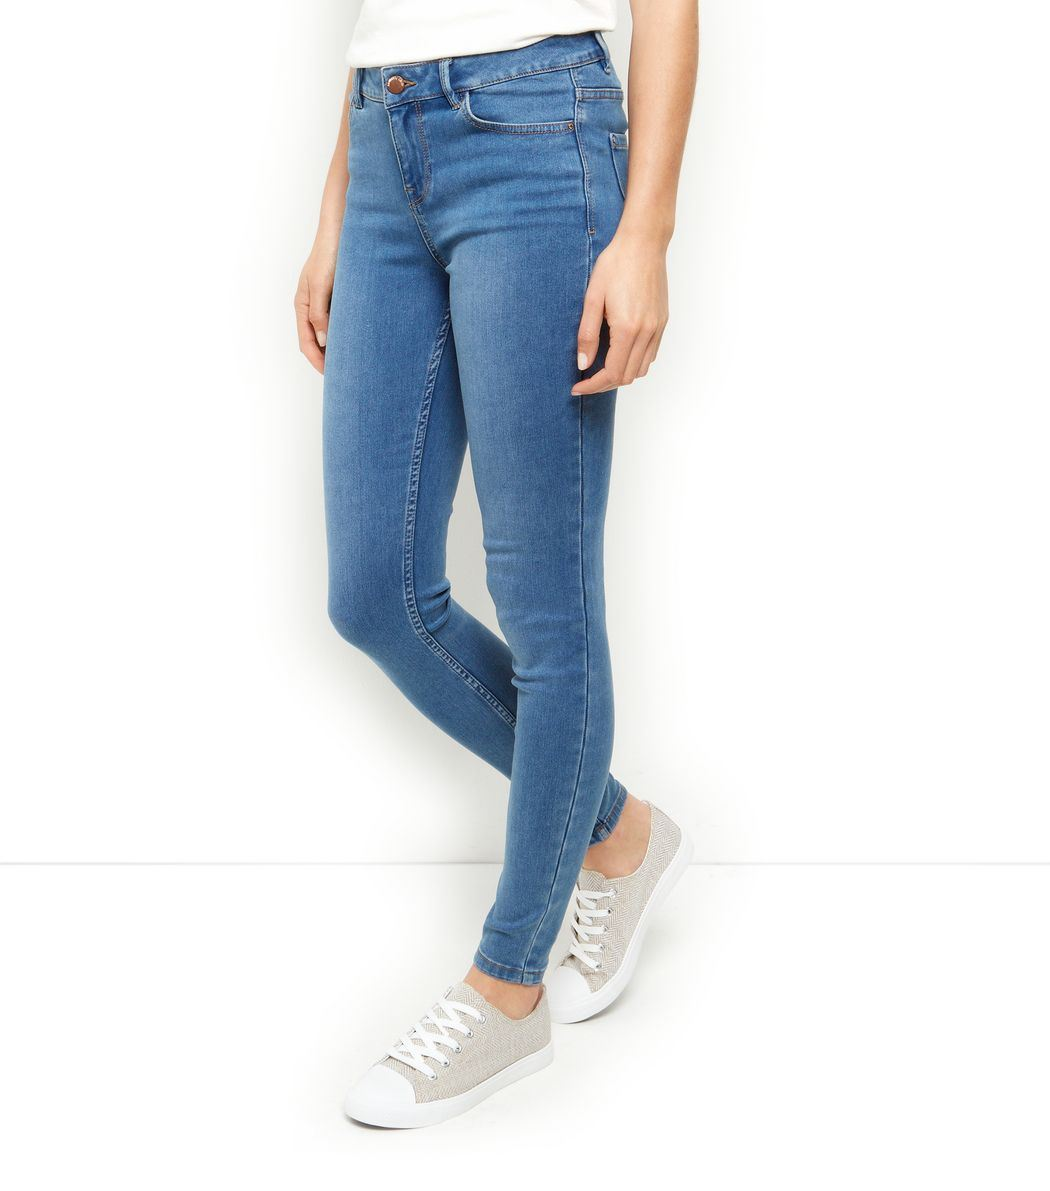 new look women 39 s casual blue jeans ebay. Black Bedroom Furniture Sets. Home Design Ideas